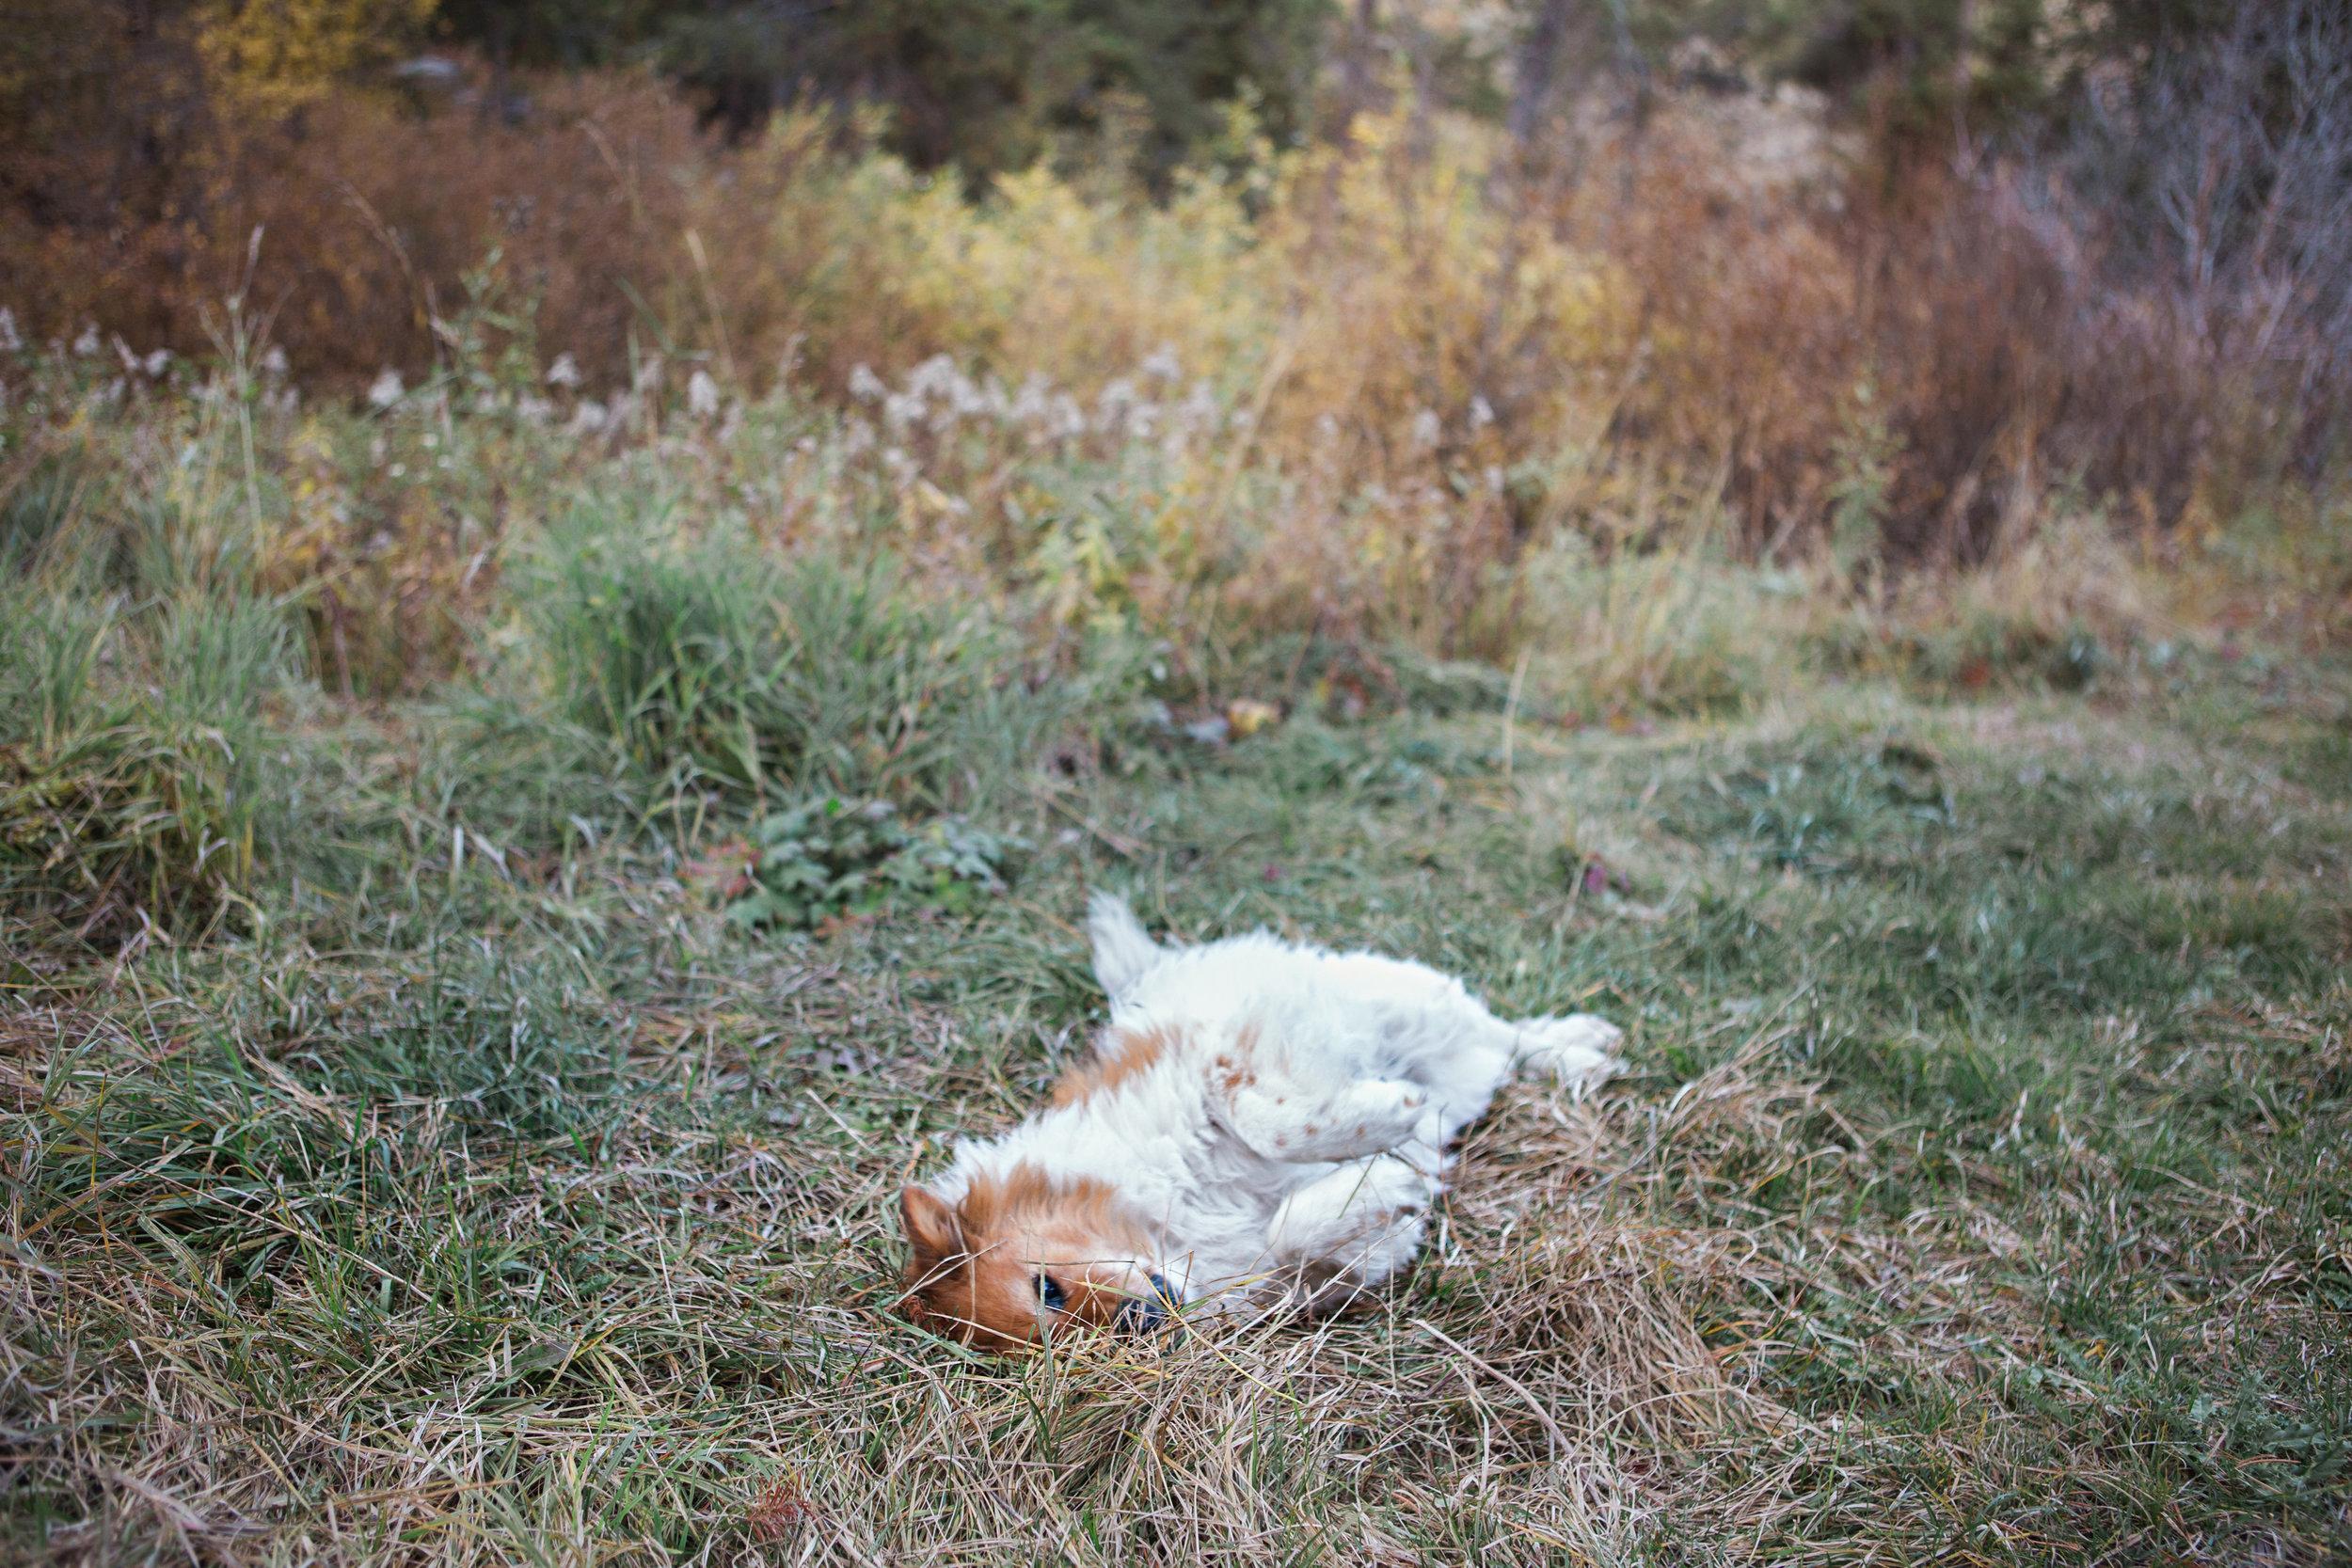 Cindy_Giovagnoli_Idaho_Wyoming_Grand_Teton_National_Park_autumn_aspens_camping_mountains-026.jpg